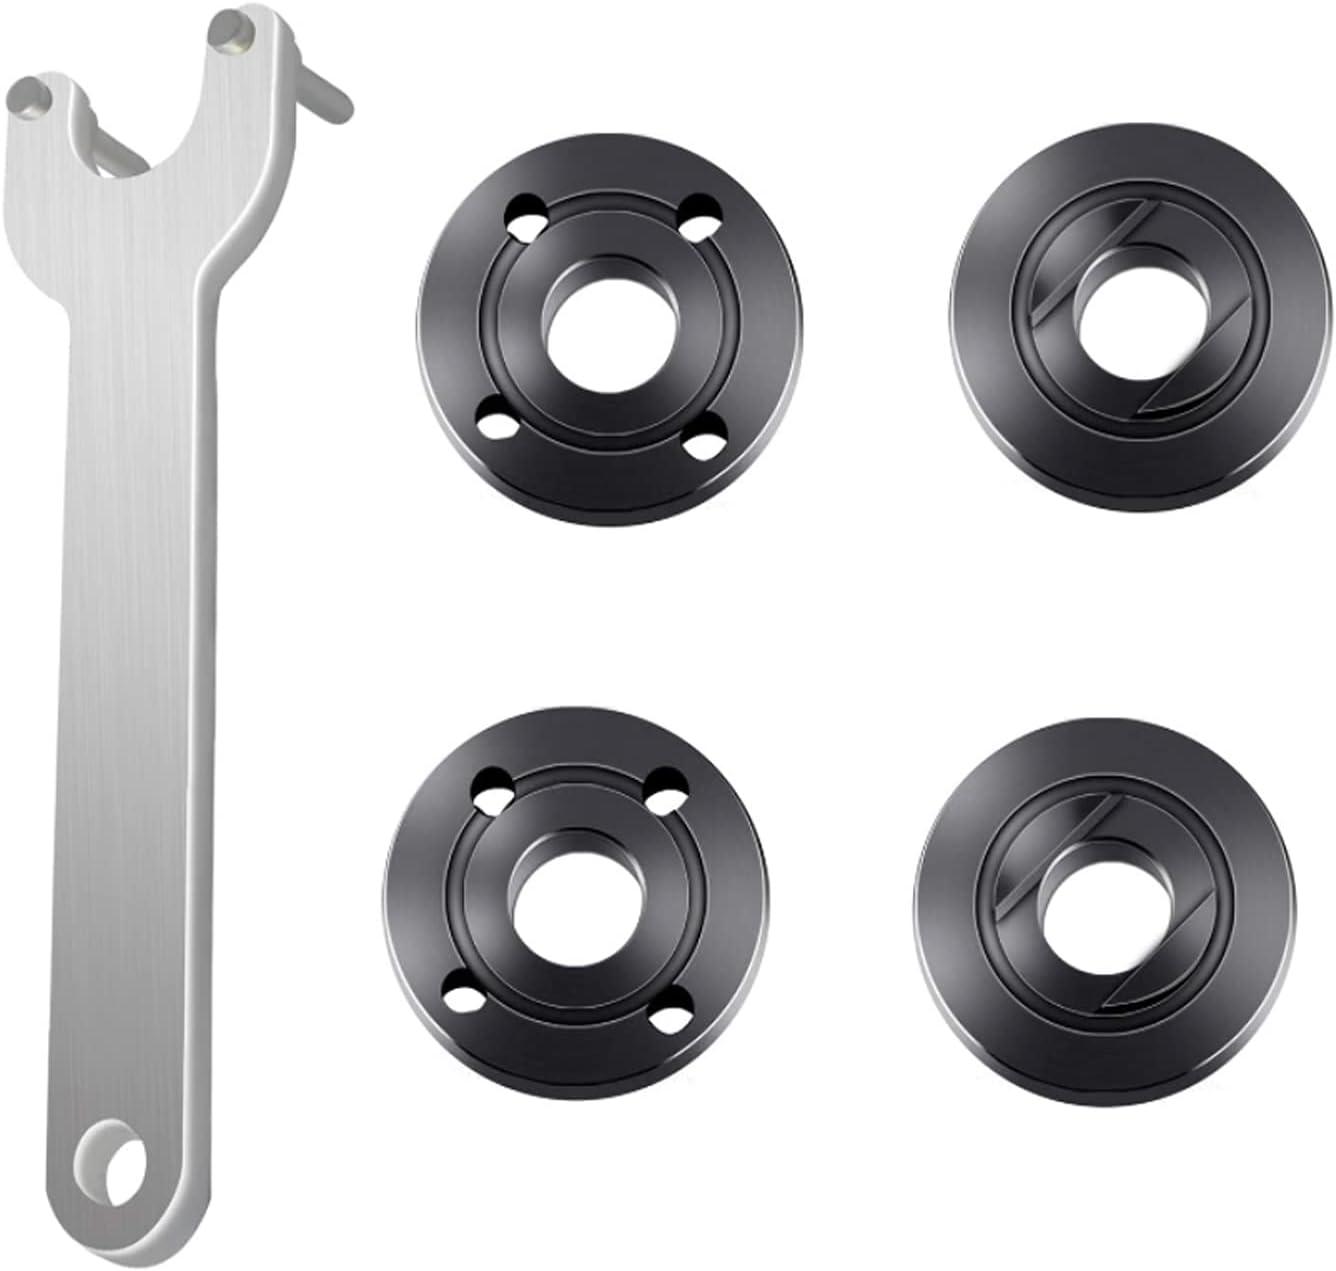 5pcs Very popular Grinder Flange Angle Wrench Spanner Metal Nuts Regular store Lock